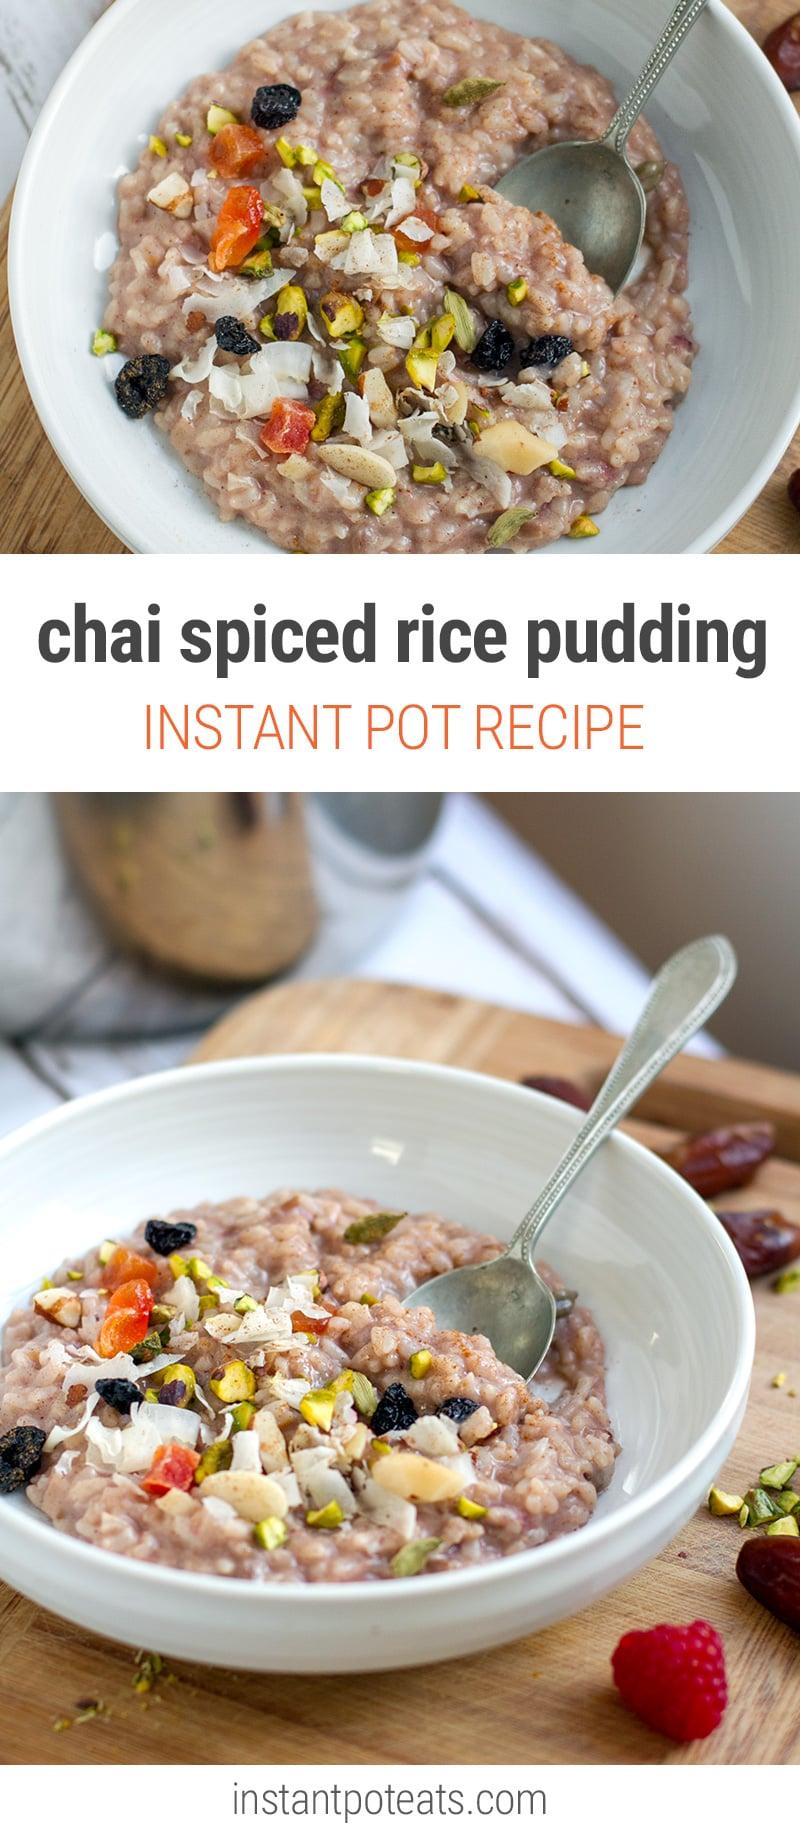 Instant Pot Rice Pudding Porridge Chai Spiced (Vegan, Gluten-free_